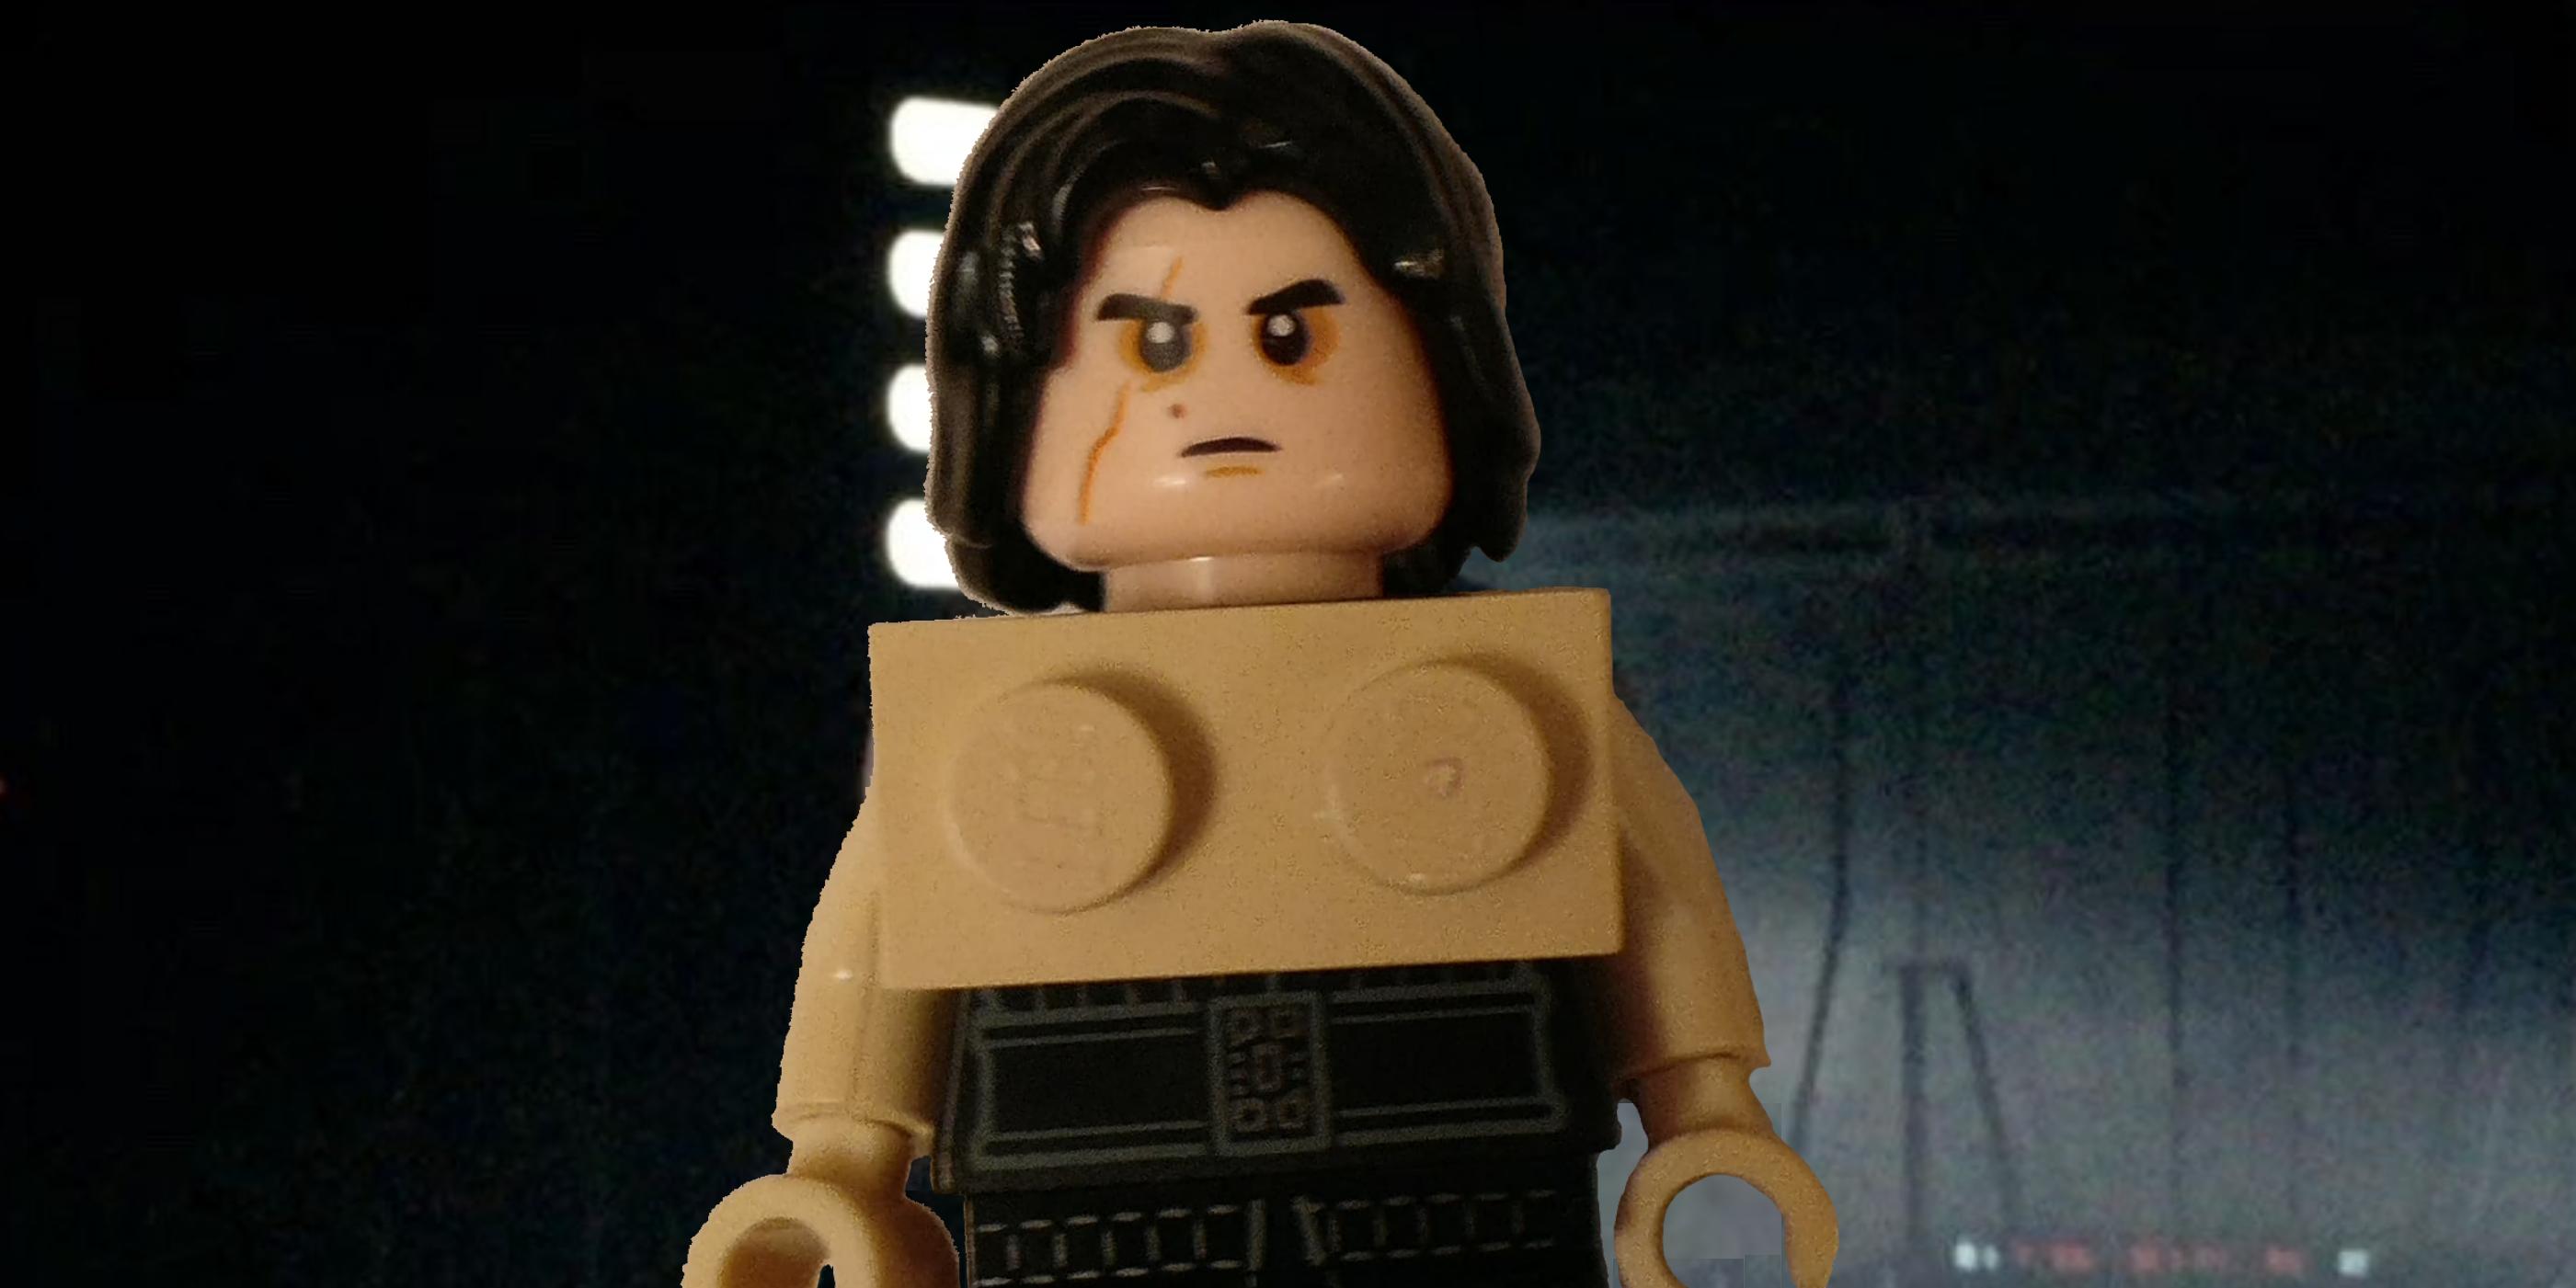 Lego Star Wars Jedi Hood Helmet Obi-Wan Darth Sith Harry Potter Brown Green Gray